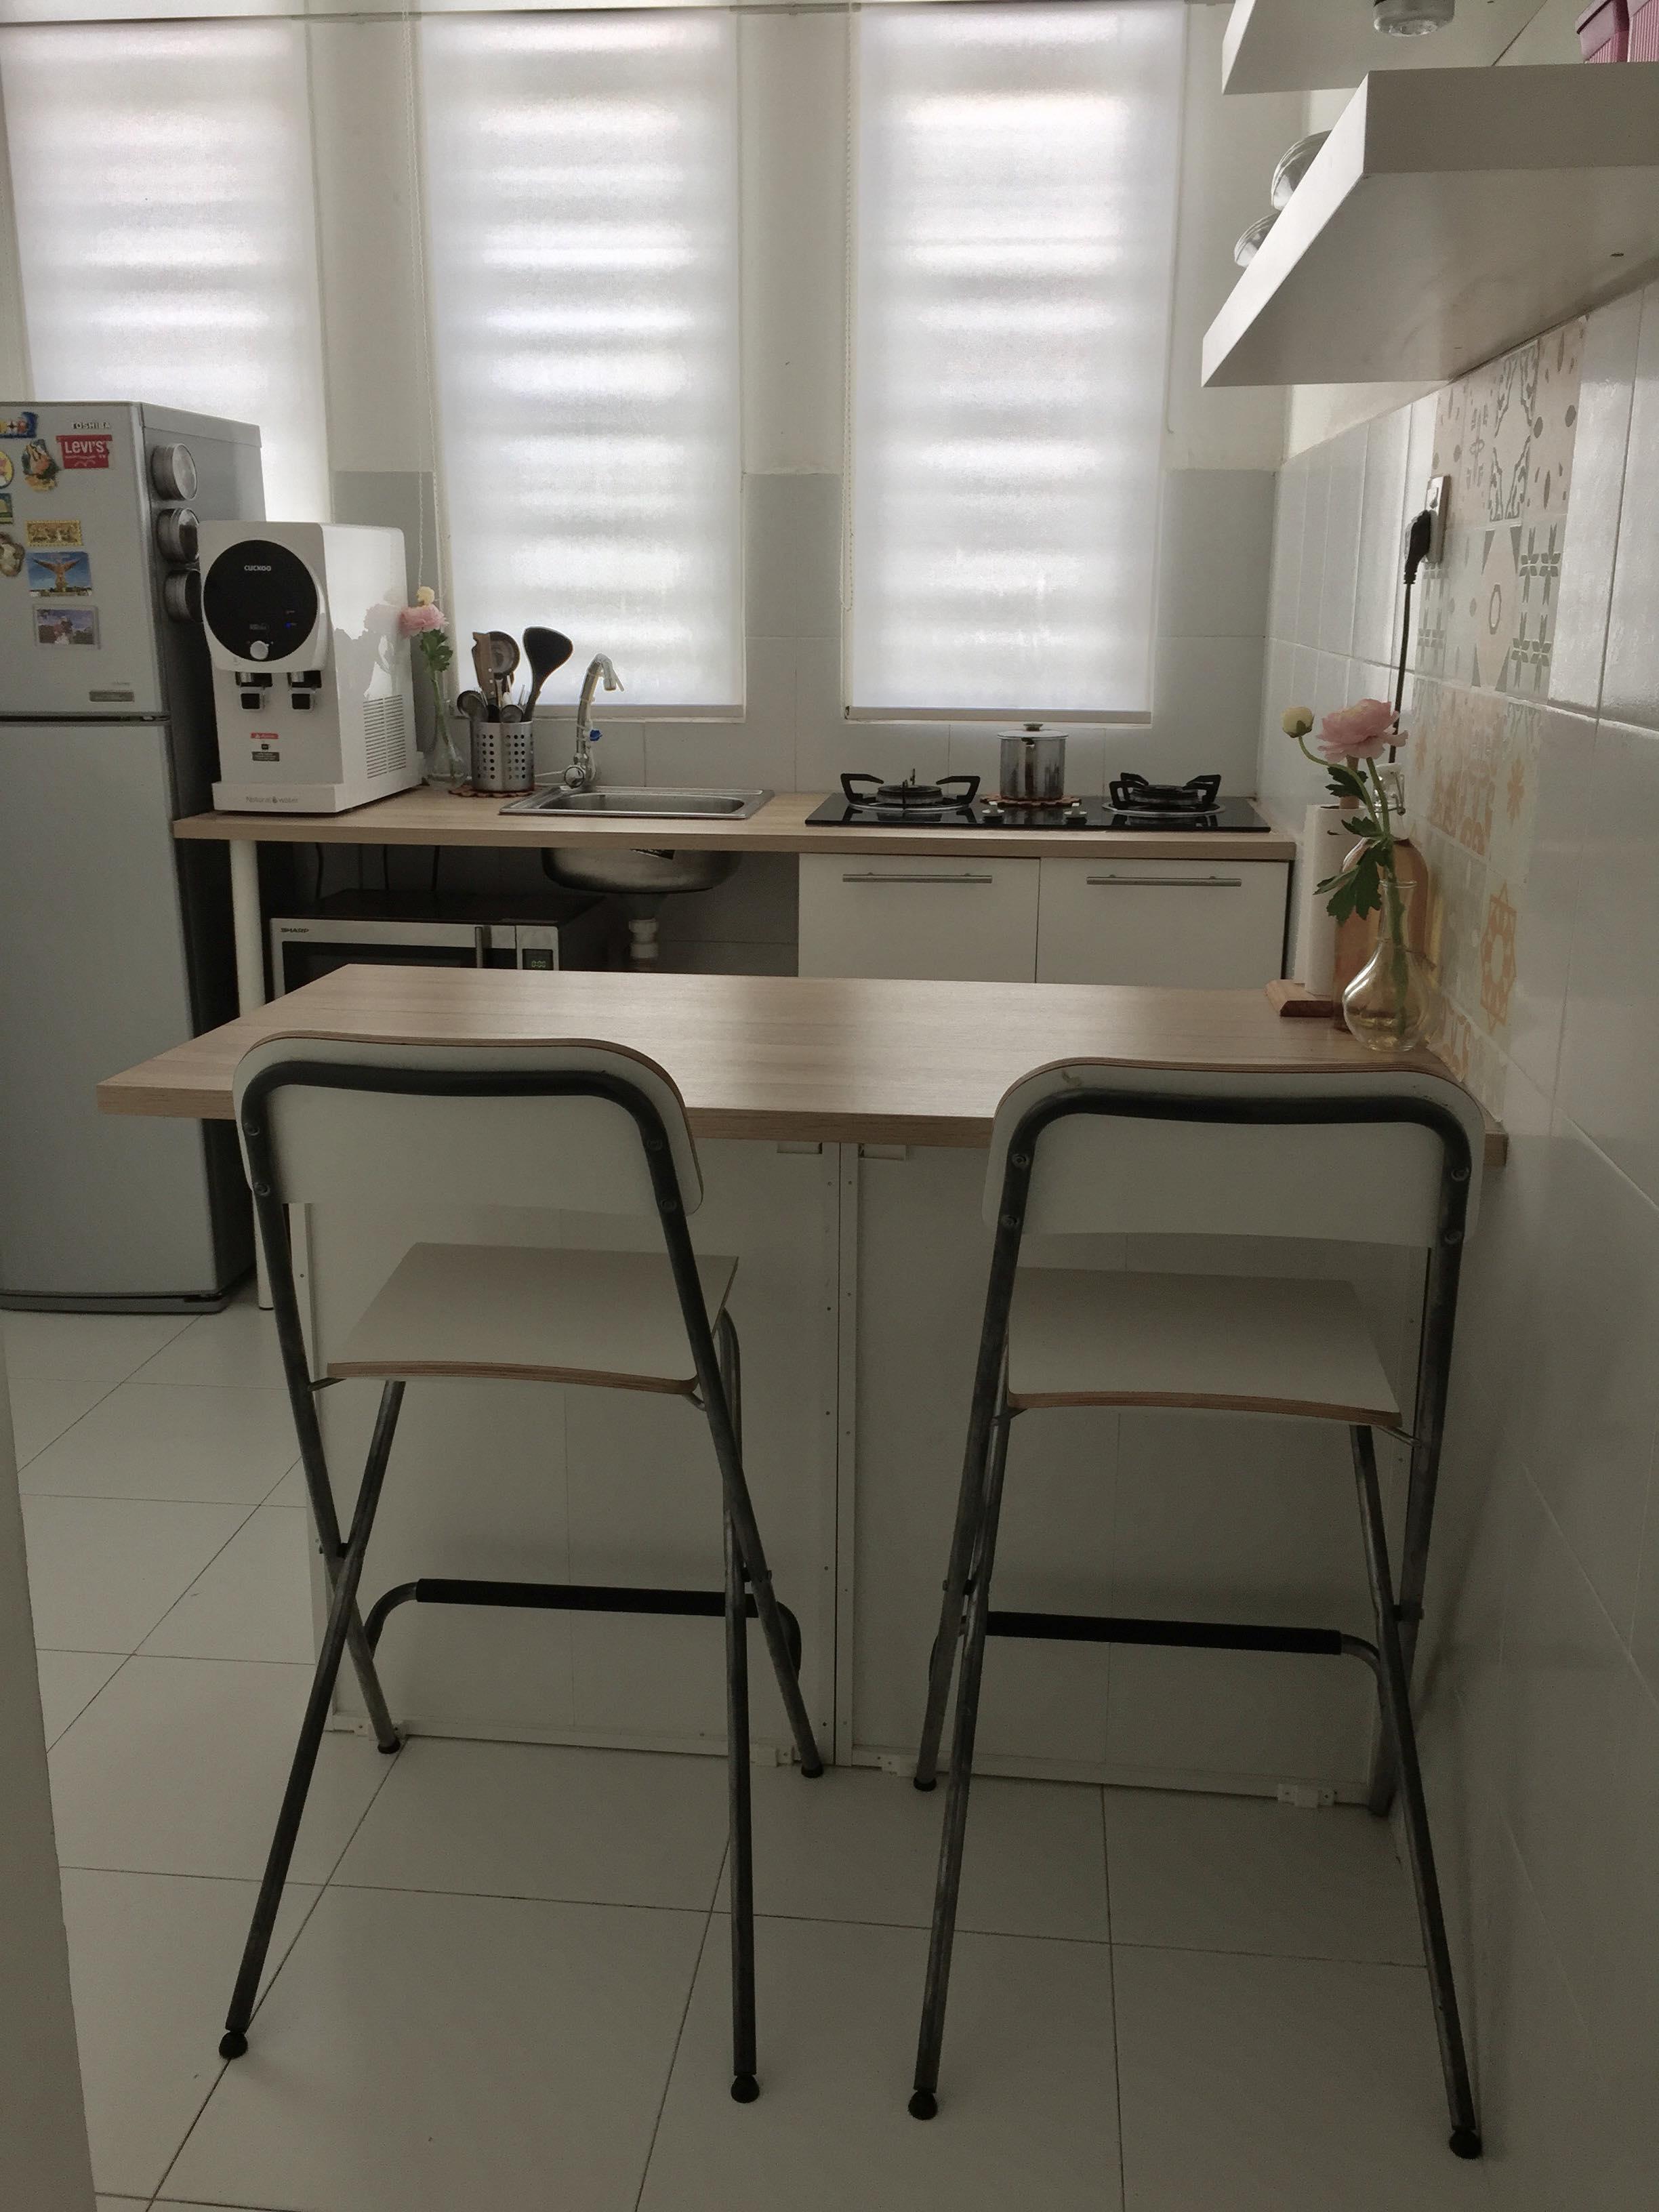 Kos Bawah Rm550 Idea Praktikal Hias Dapur Sempit Dengan